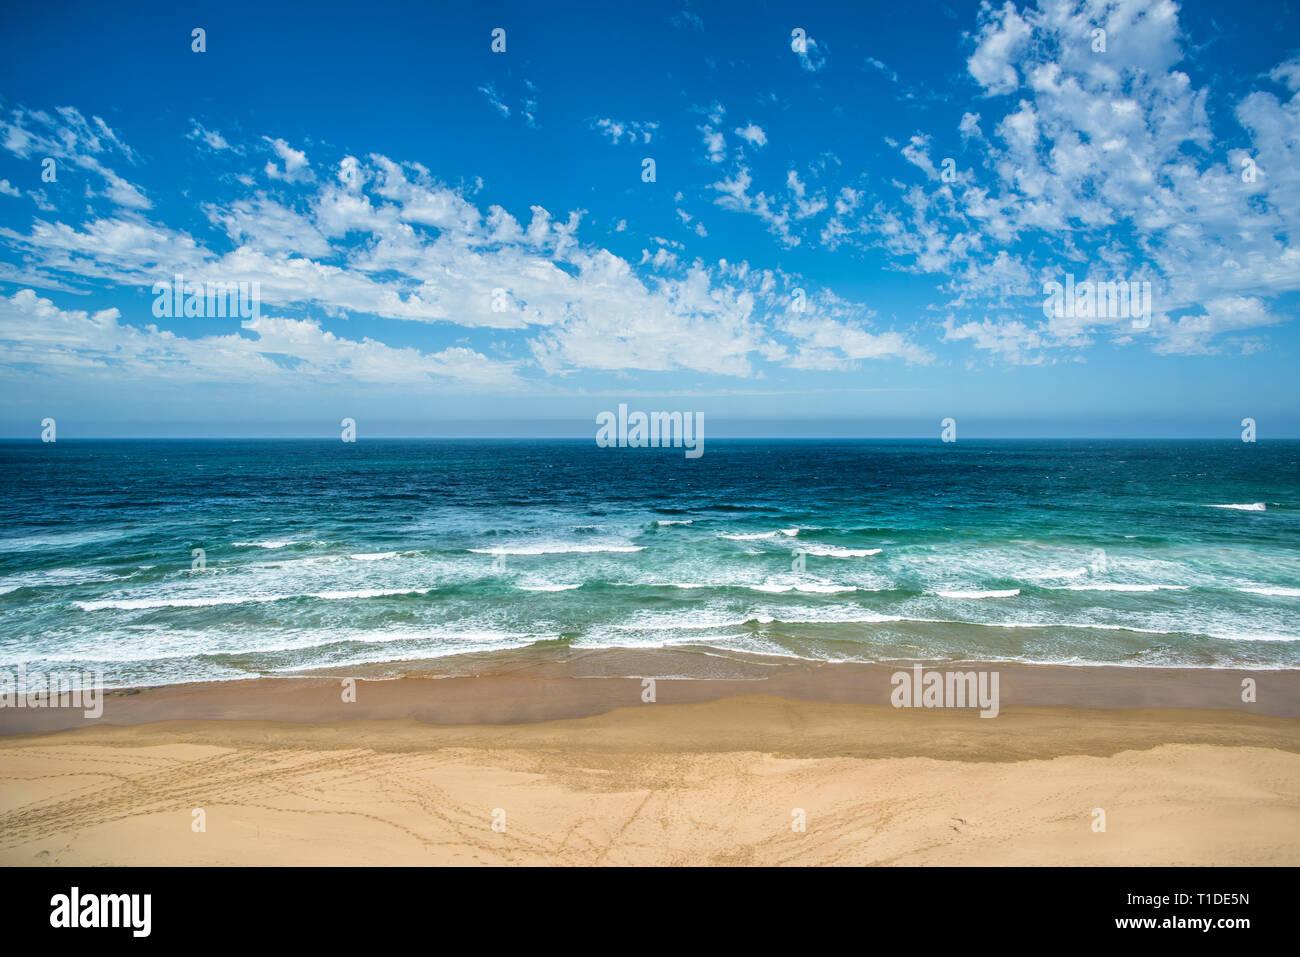 Yellow sand beach, sea and deep blue sky - Stock Image